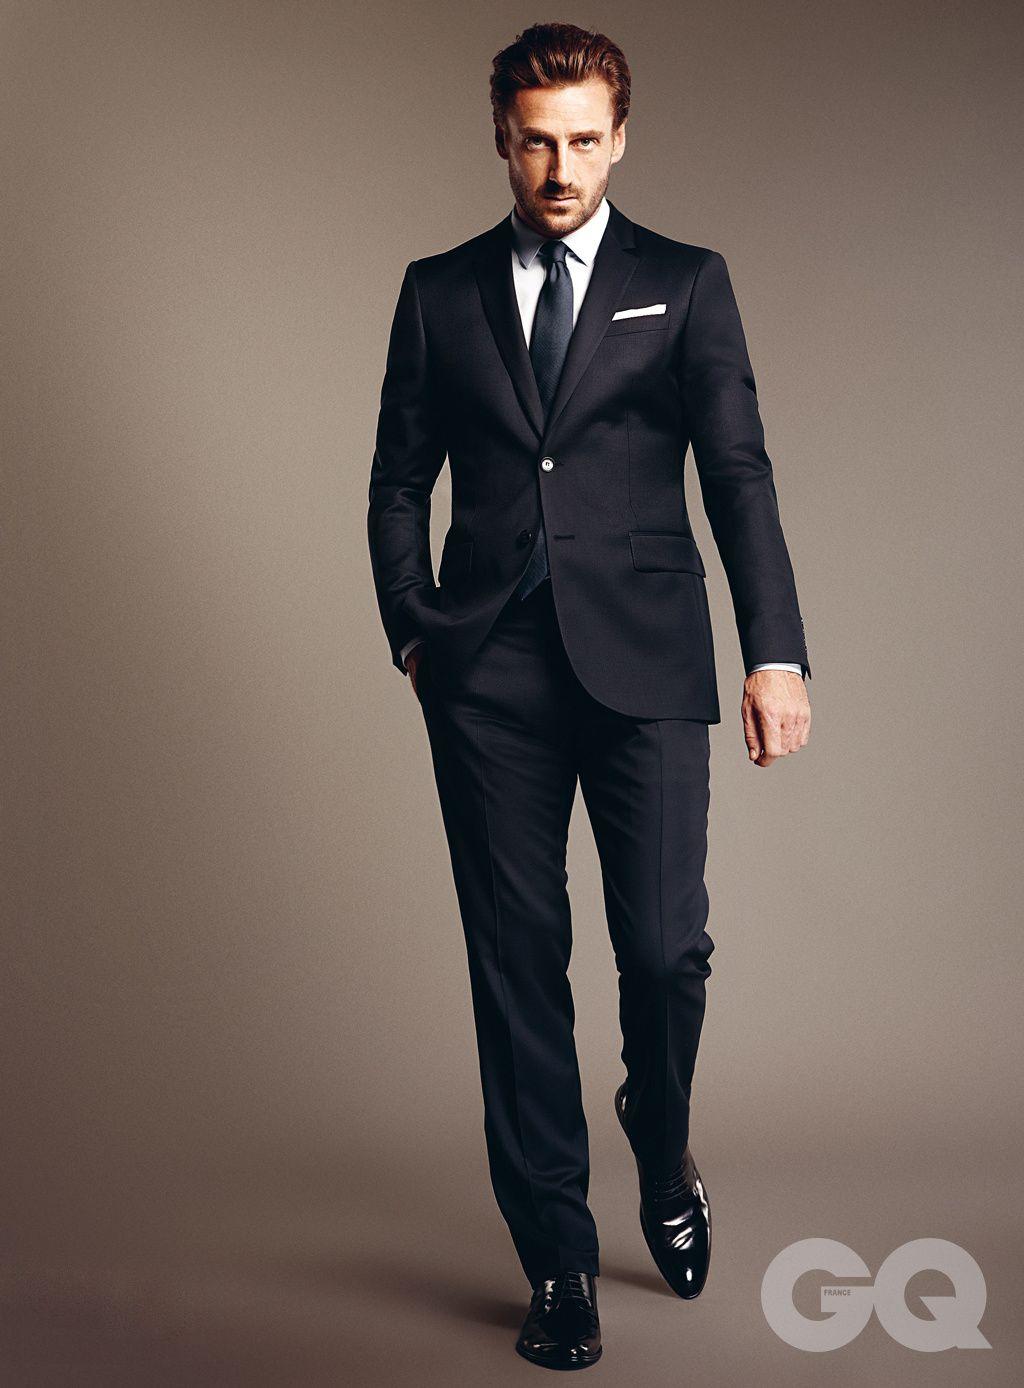 le costume homme mode d 39 emploi by gq suitable mens fashion fashion costumes. Black Bedroom Furniture Sets. Home Design Ideas